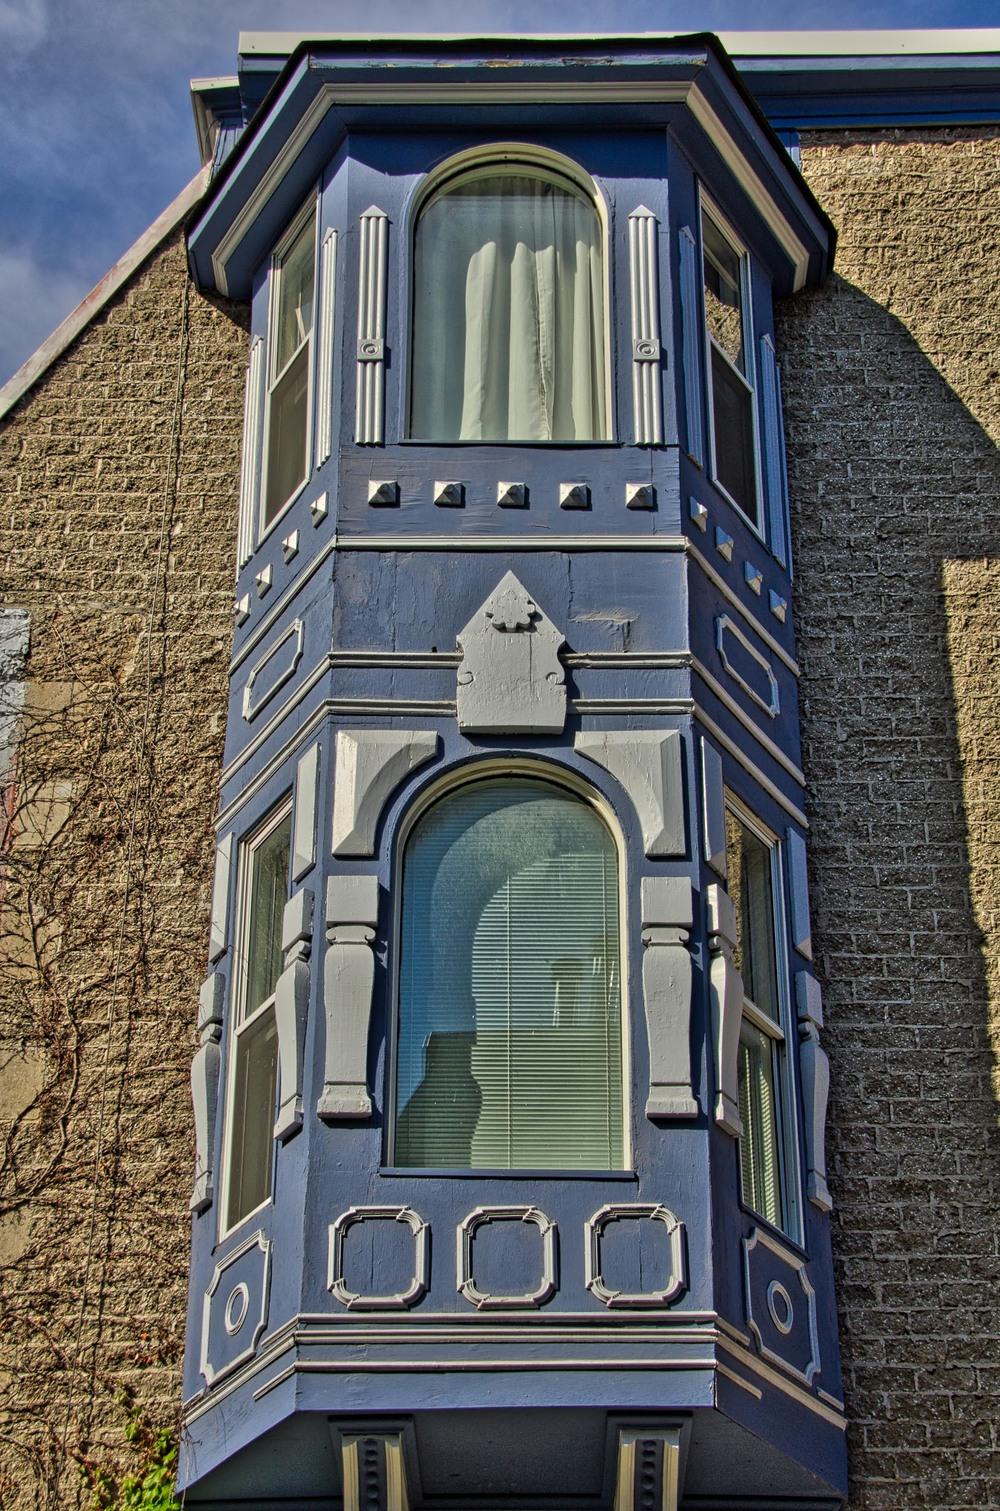 Prince Arthur Architecture-27_AuroraHDR_HDR.jpg